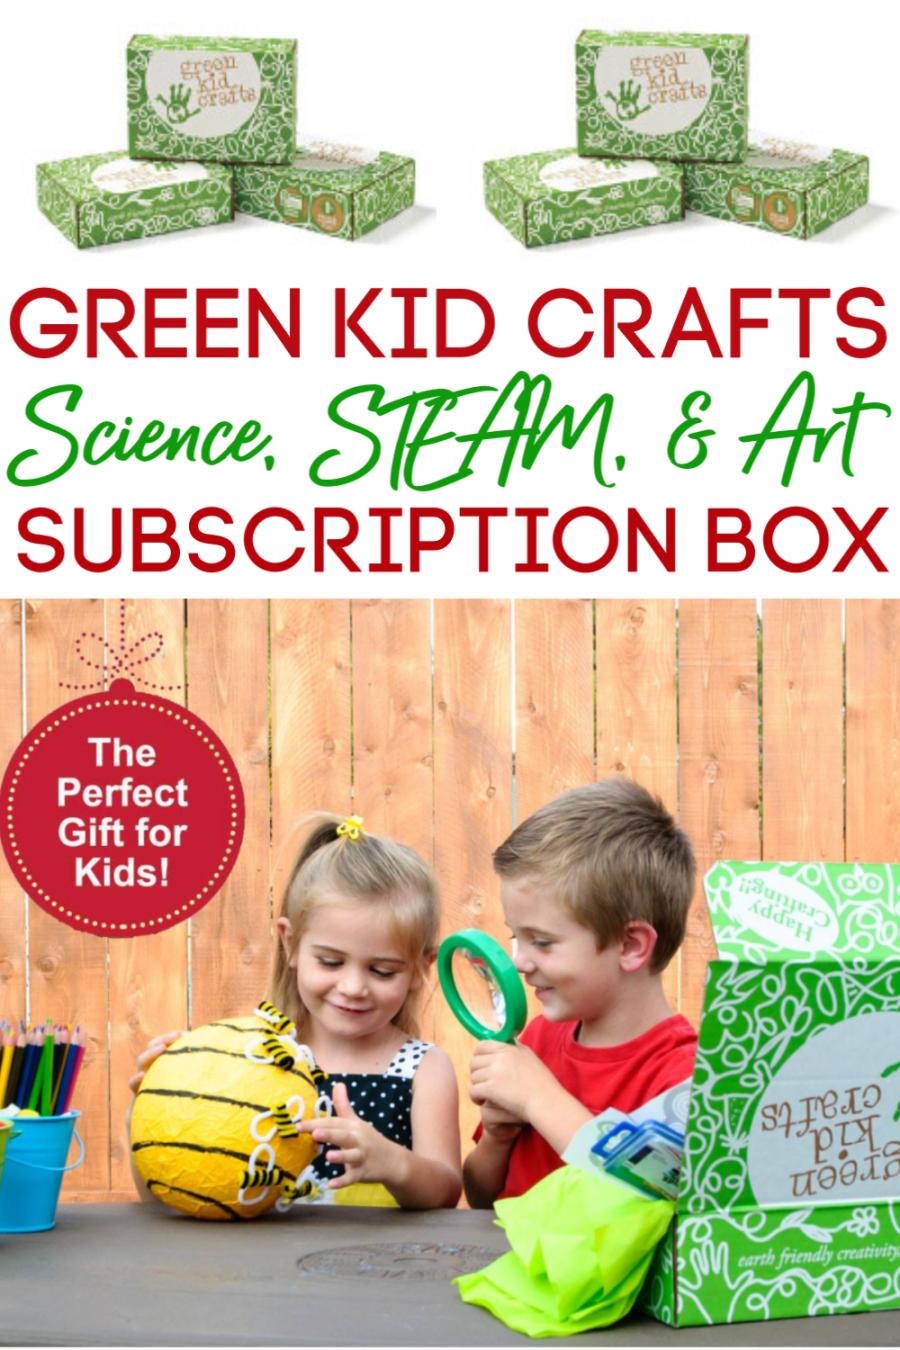 Green Kid Crafts Subscription Box 5